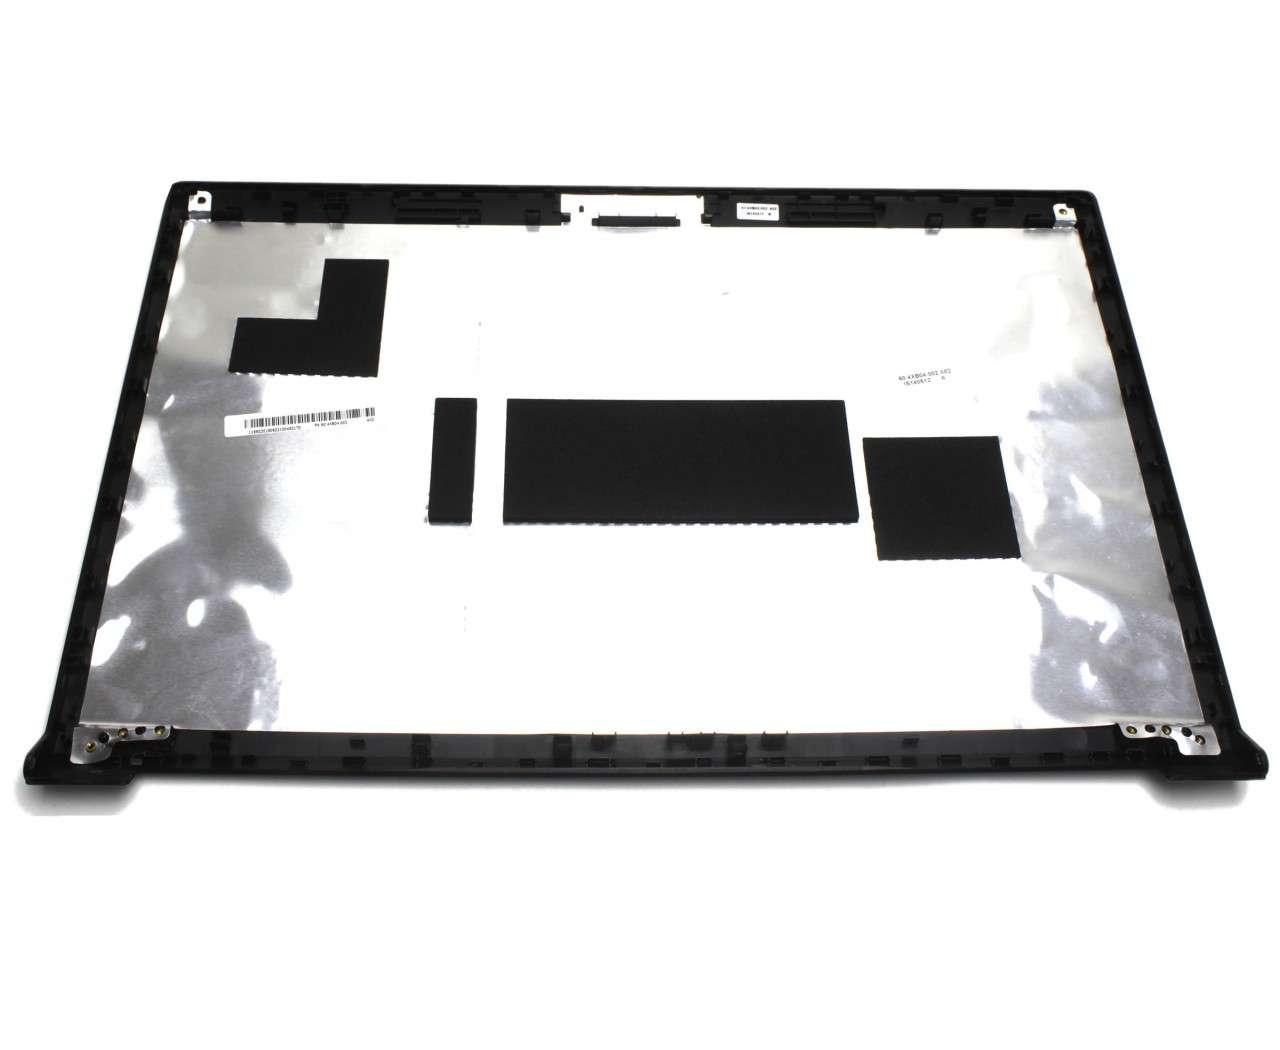 Capac Display BackCover IBM Lenovo B590 Carcasa Display Neagra imagine powerlaptop.ro 2021